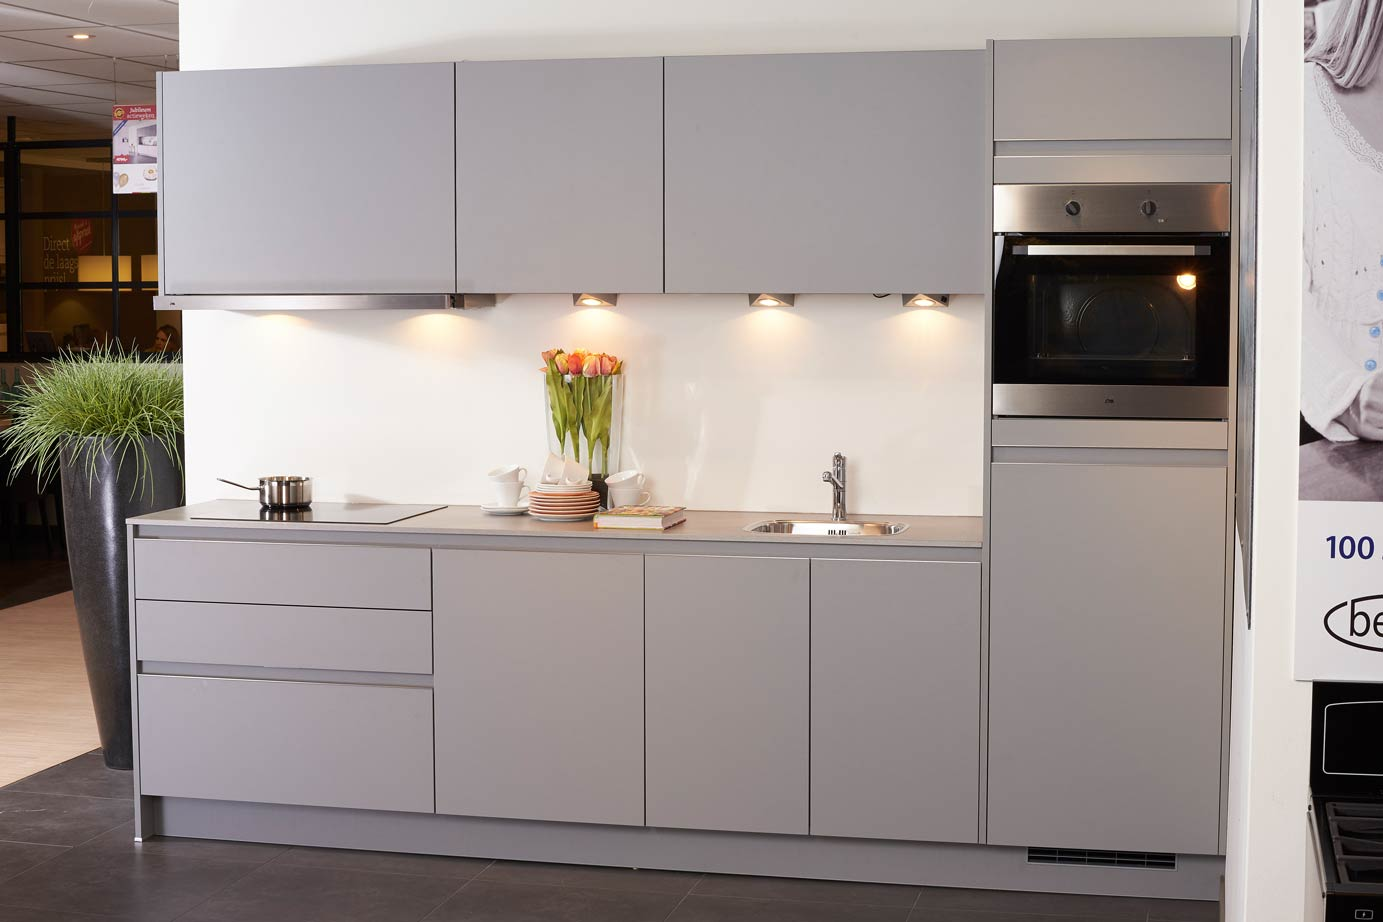 Greeploze Design Keukens : Greeploze keuken kopen strak en modern design db keukens